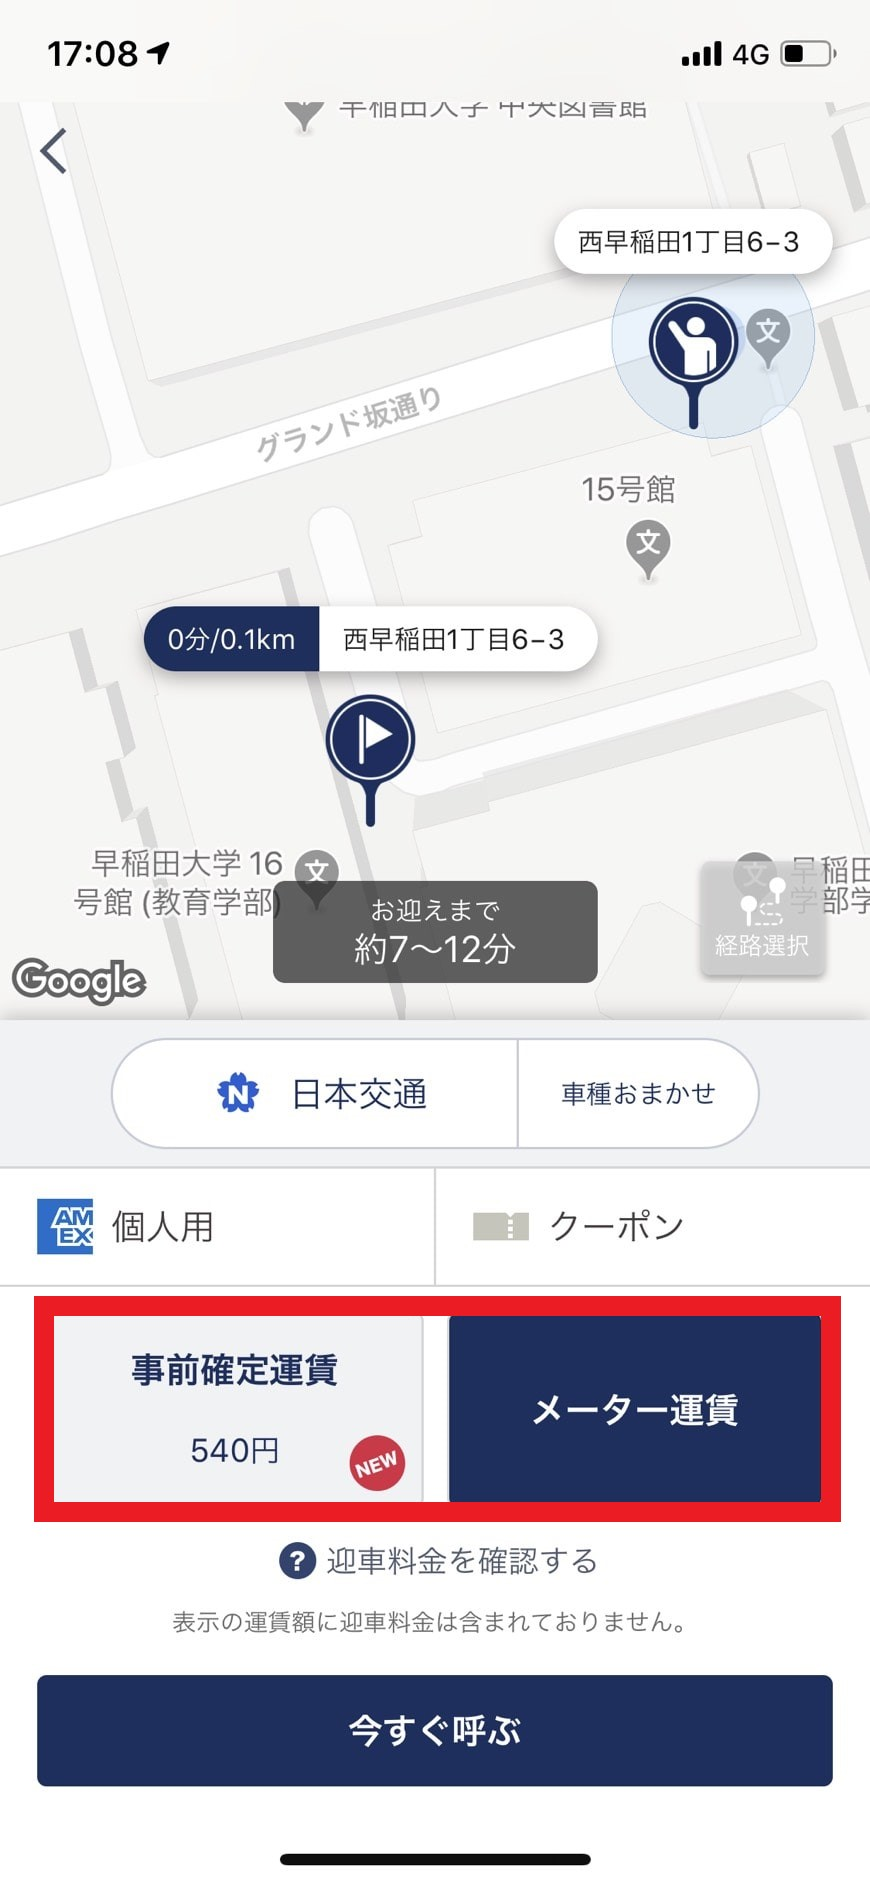 JapanTaxiで事前確定運賃かメーター運賃を選択